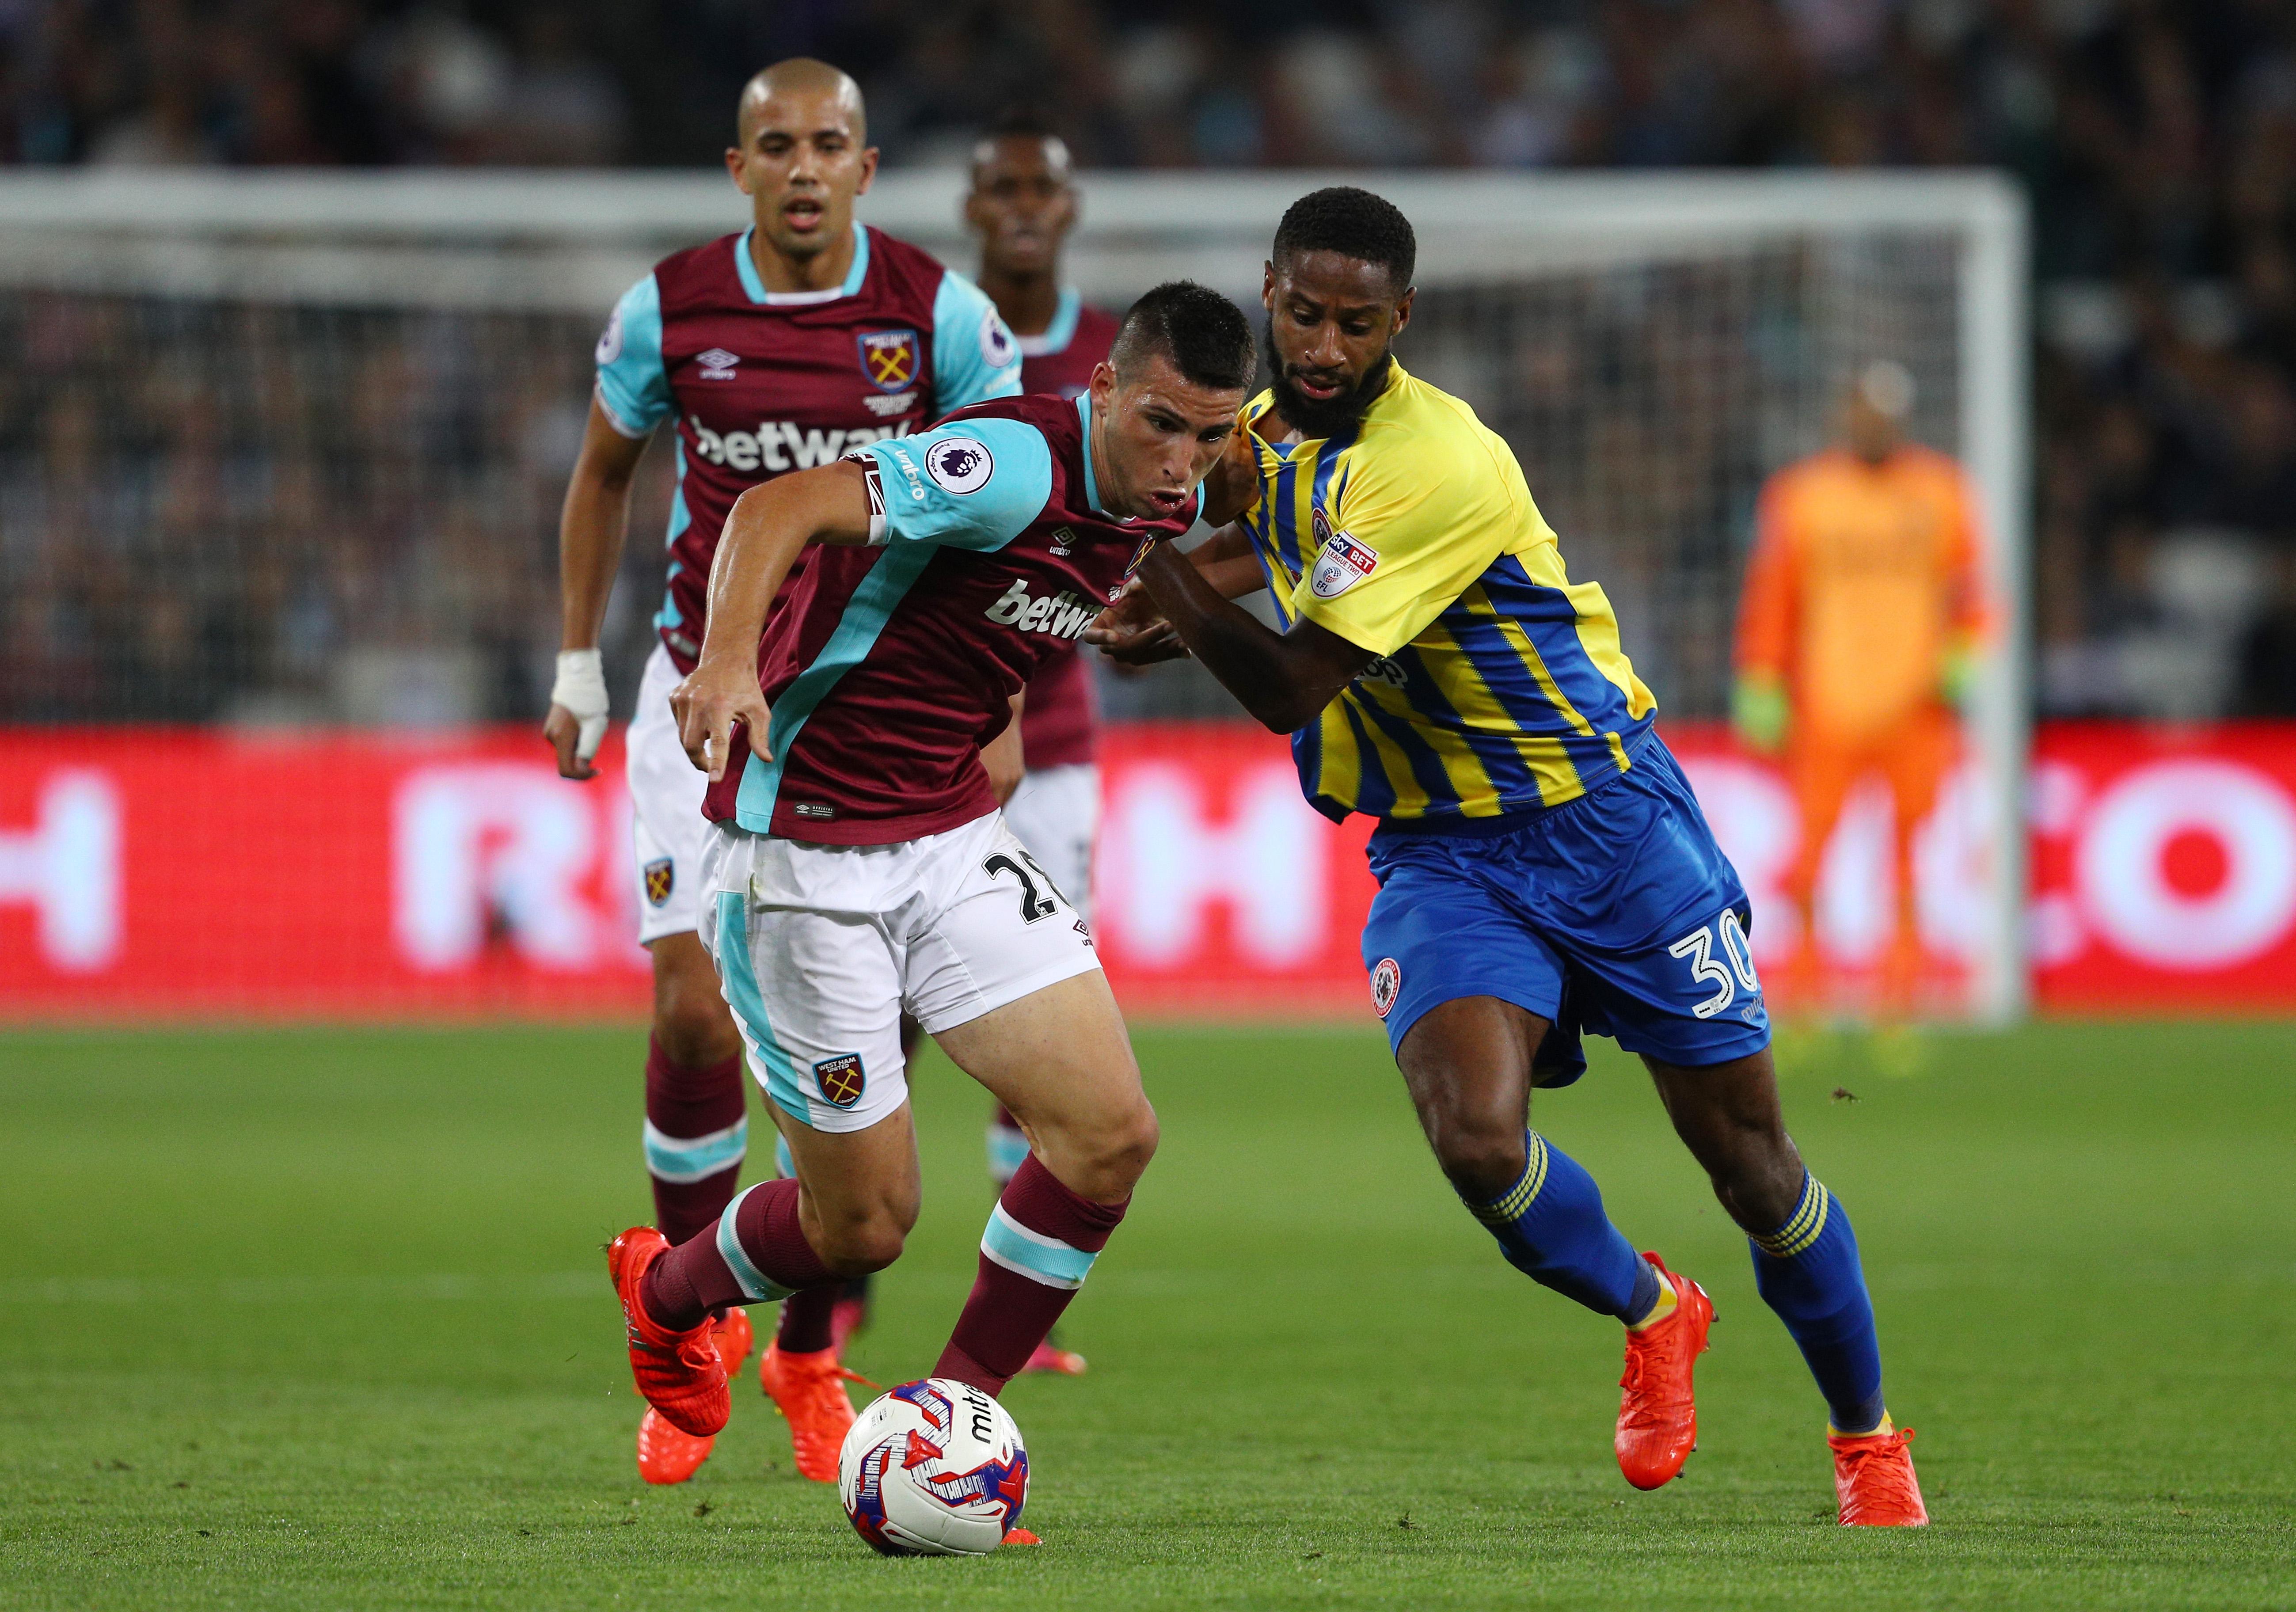 Swansea 1-4 West Ham: Slaven Bilic lauds season's best performance